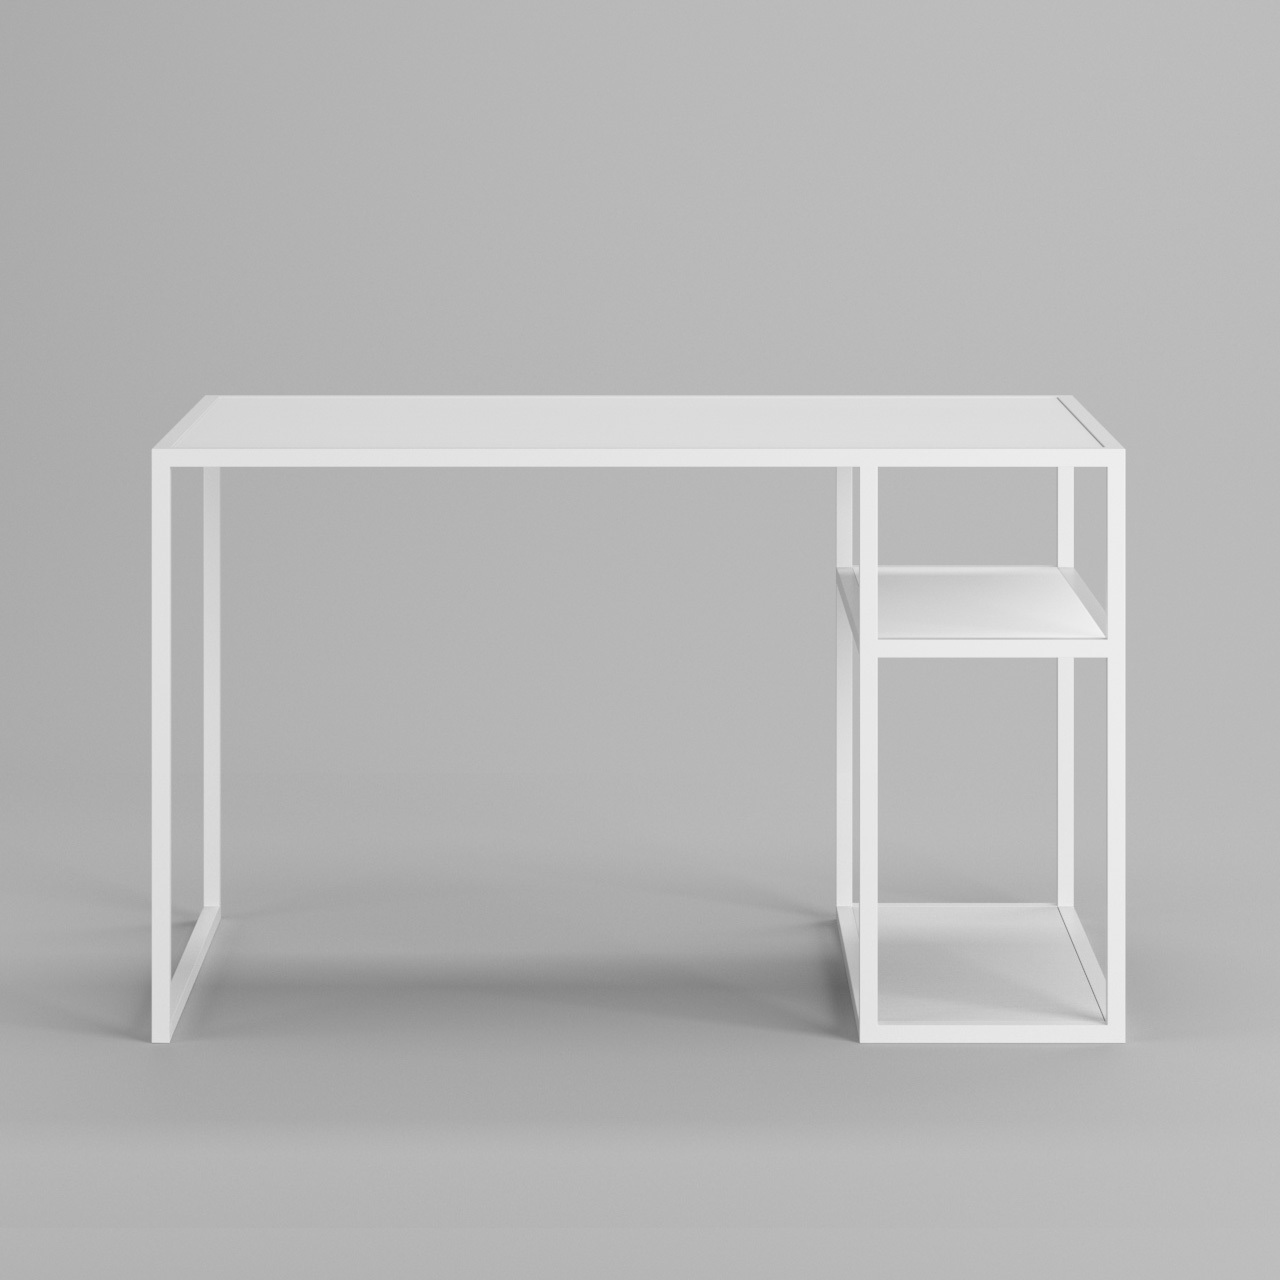 Рабочий стол Romero white - вид 2